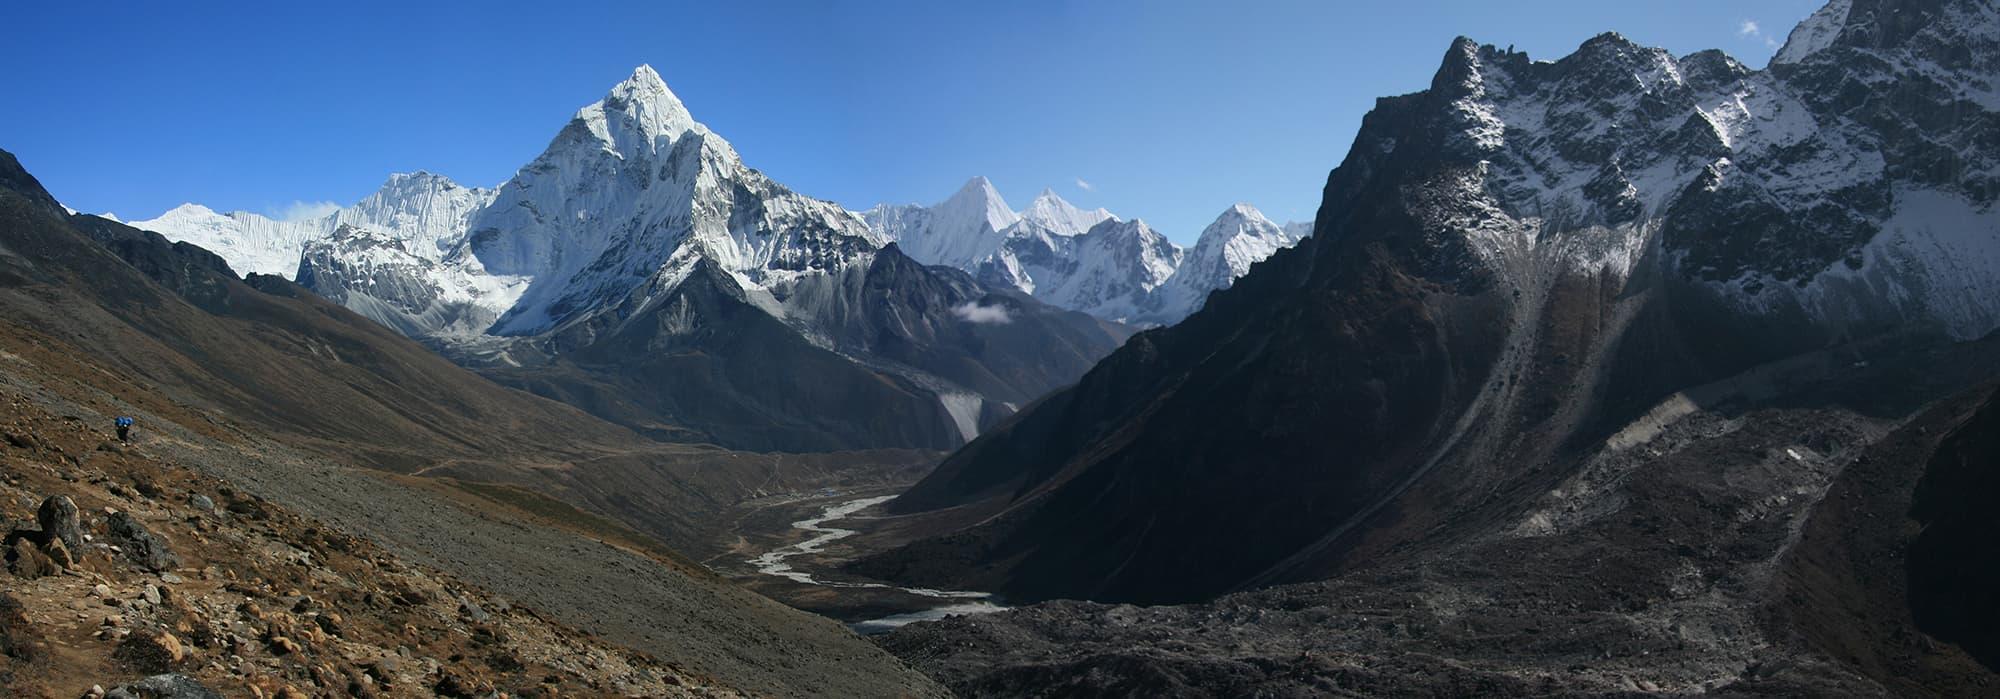 Everest Base Camp and Passes Trek